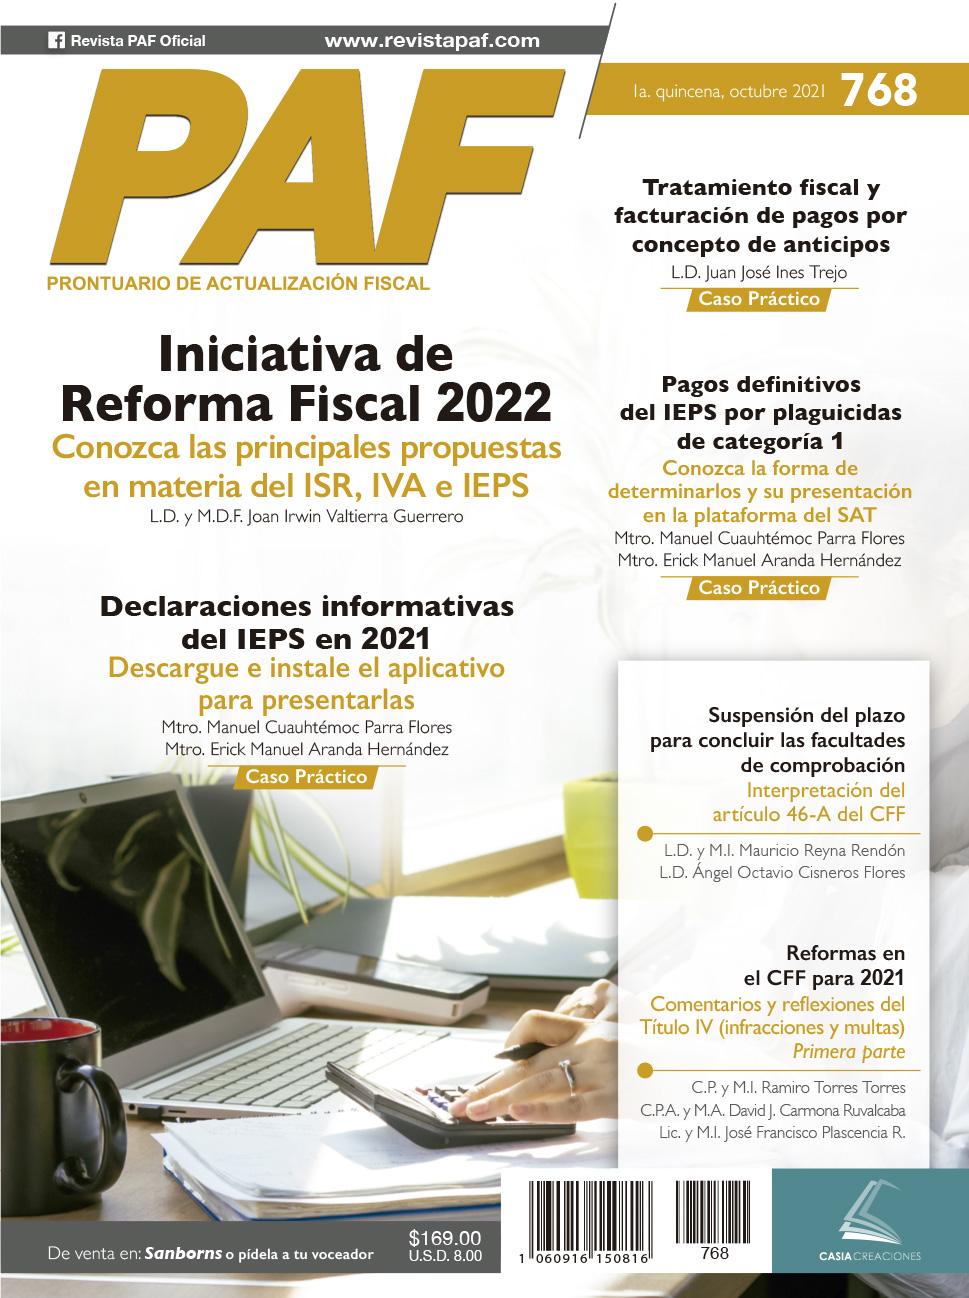 Iniciativa de reforma fiscal 2022